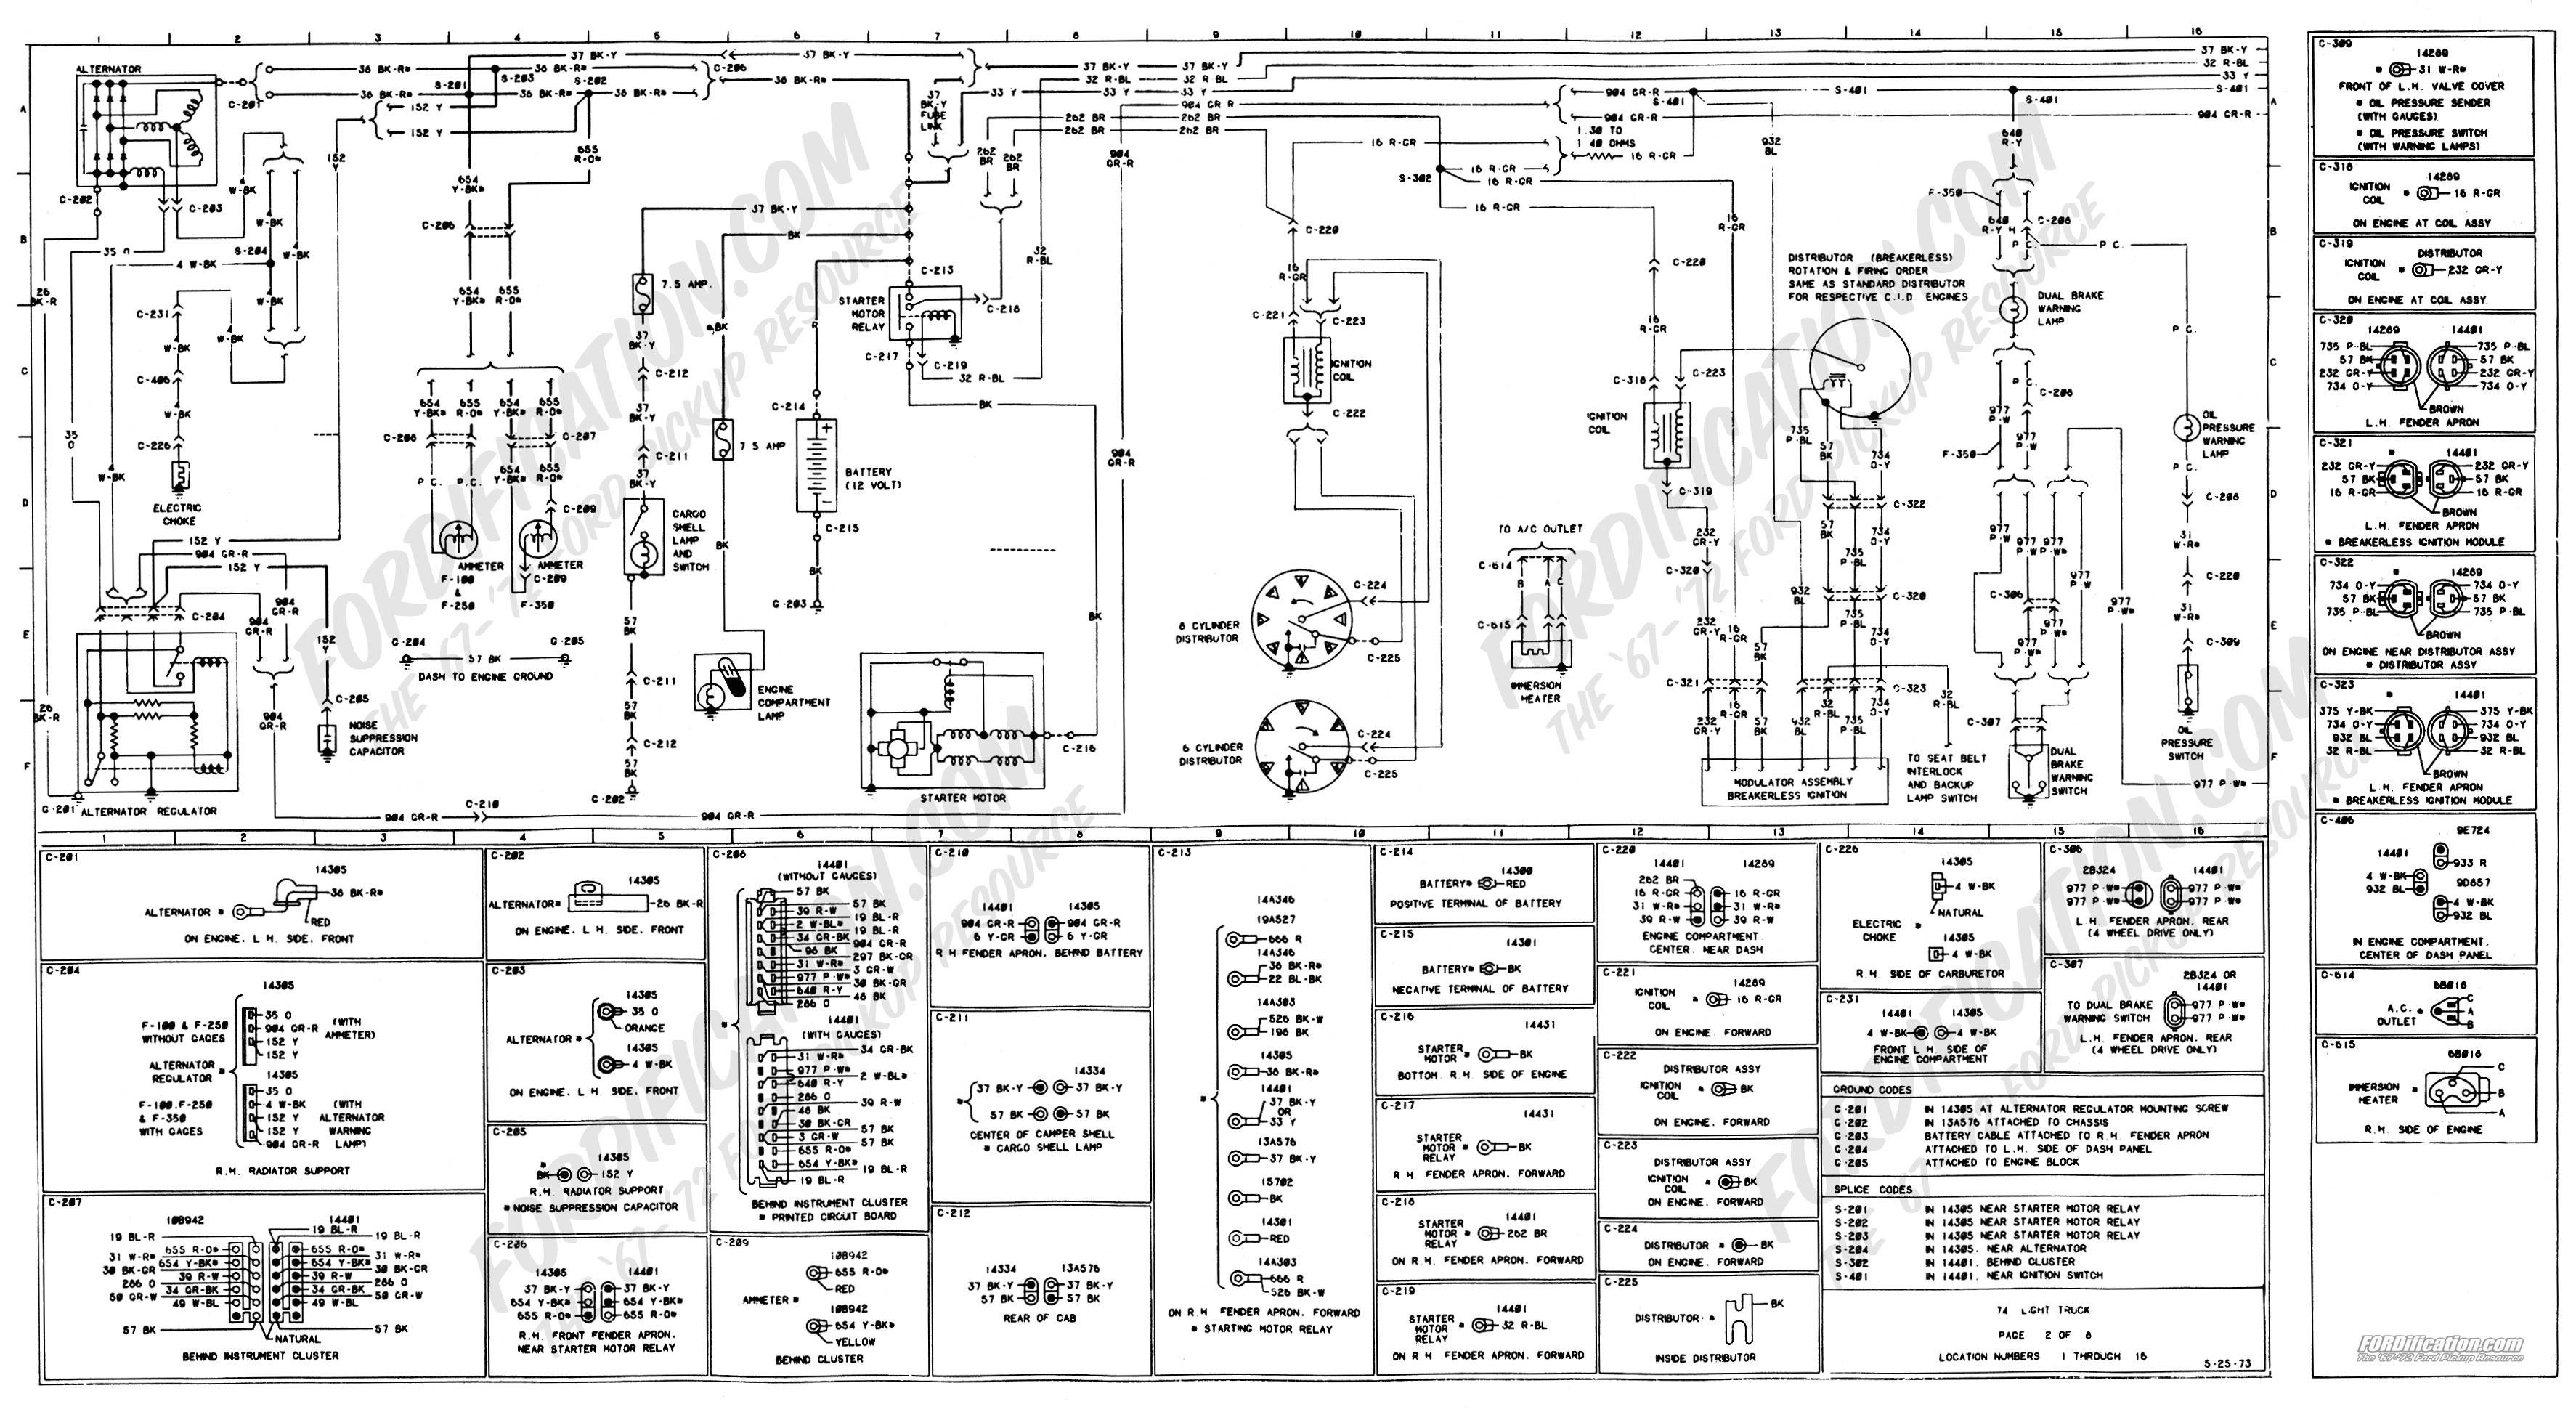 sterling fuse box wiring schematics diagram rh enr green com Breaker Box  Wiring Diagram Ford Fuse Box Diagram